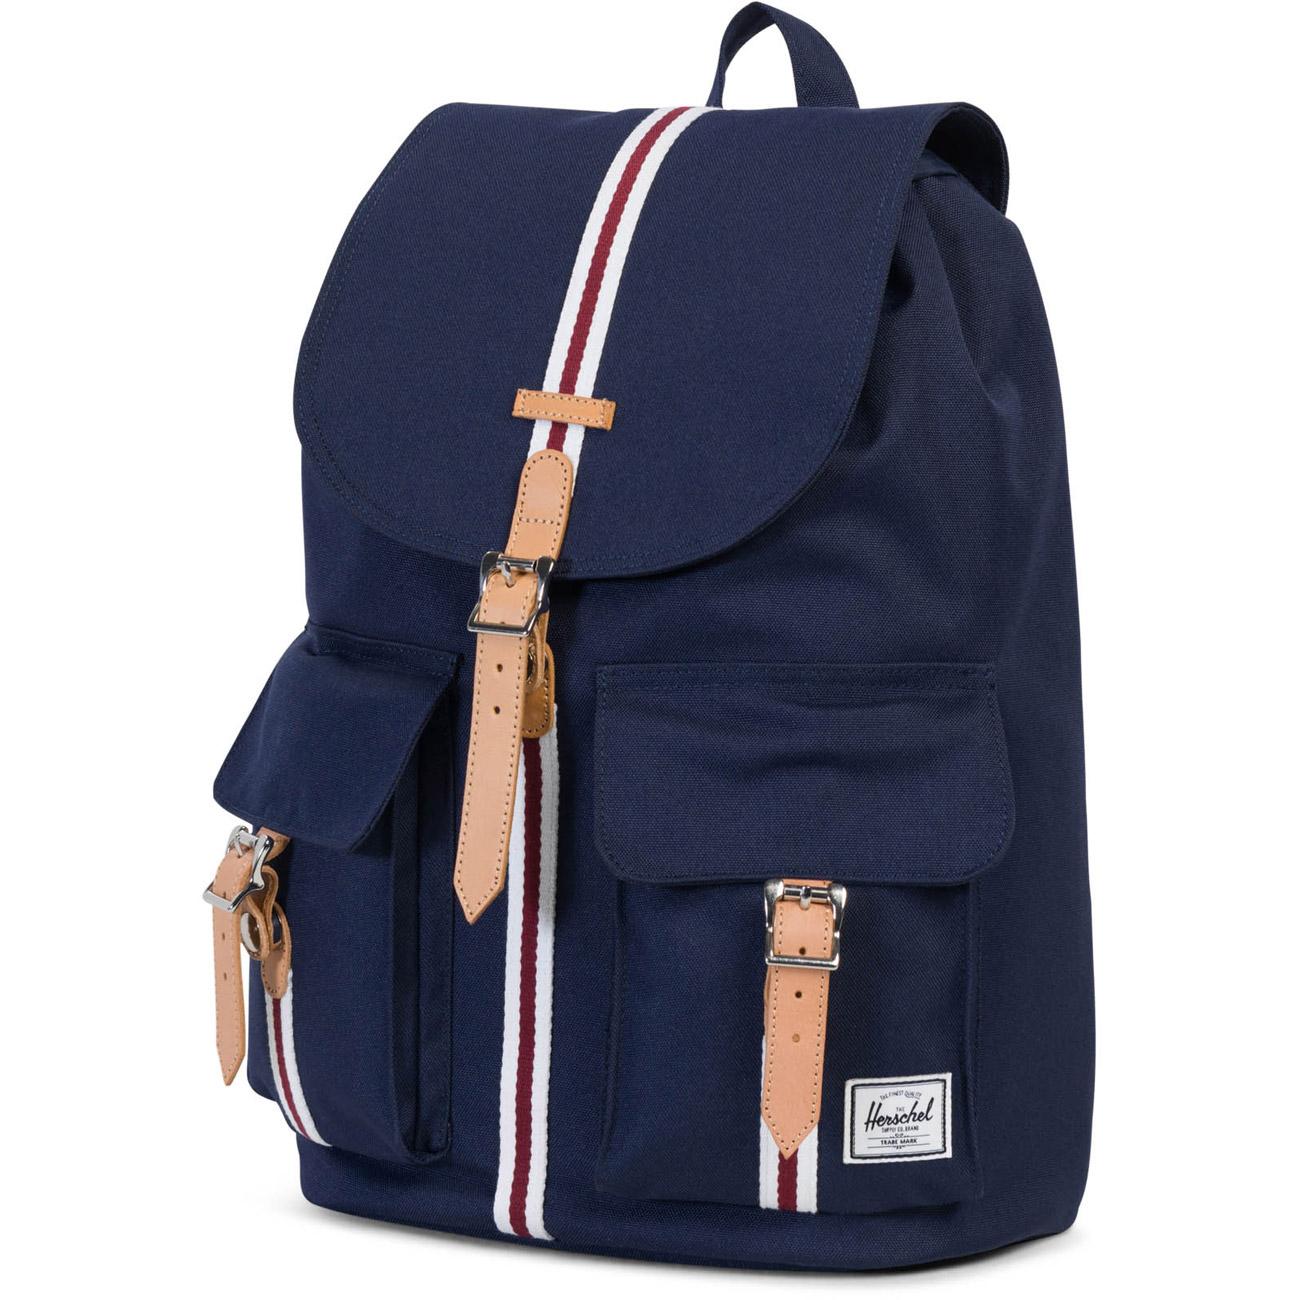 herschel herren rucksack dawson backpack ebay. Black Bedroom Furniture Sets. Home Design Ideas